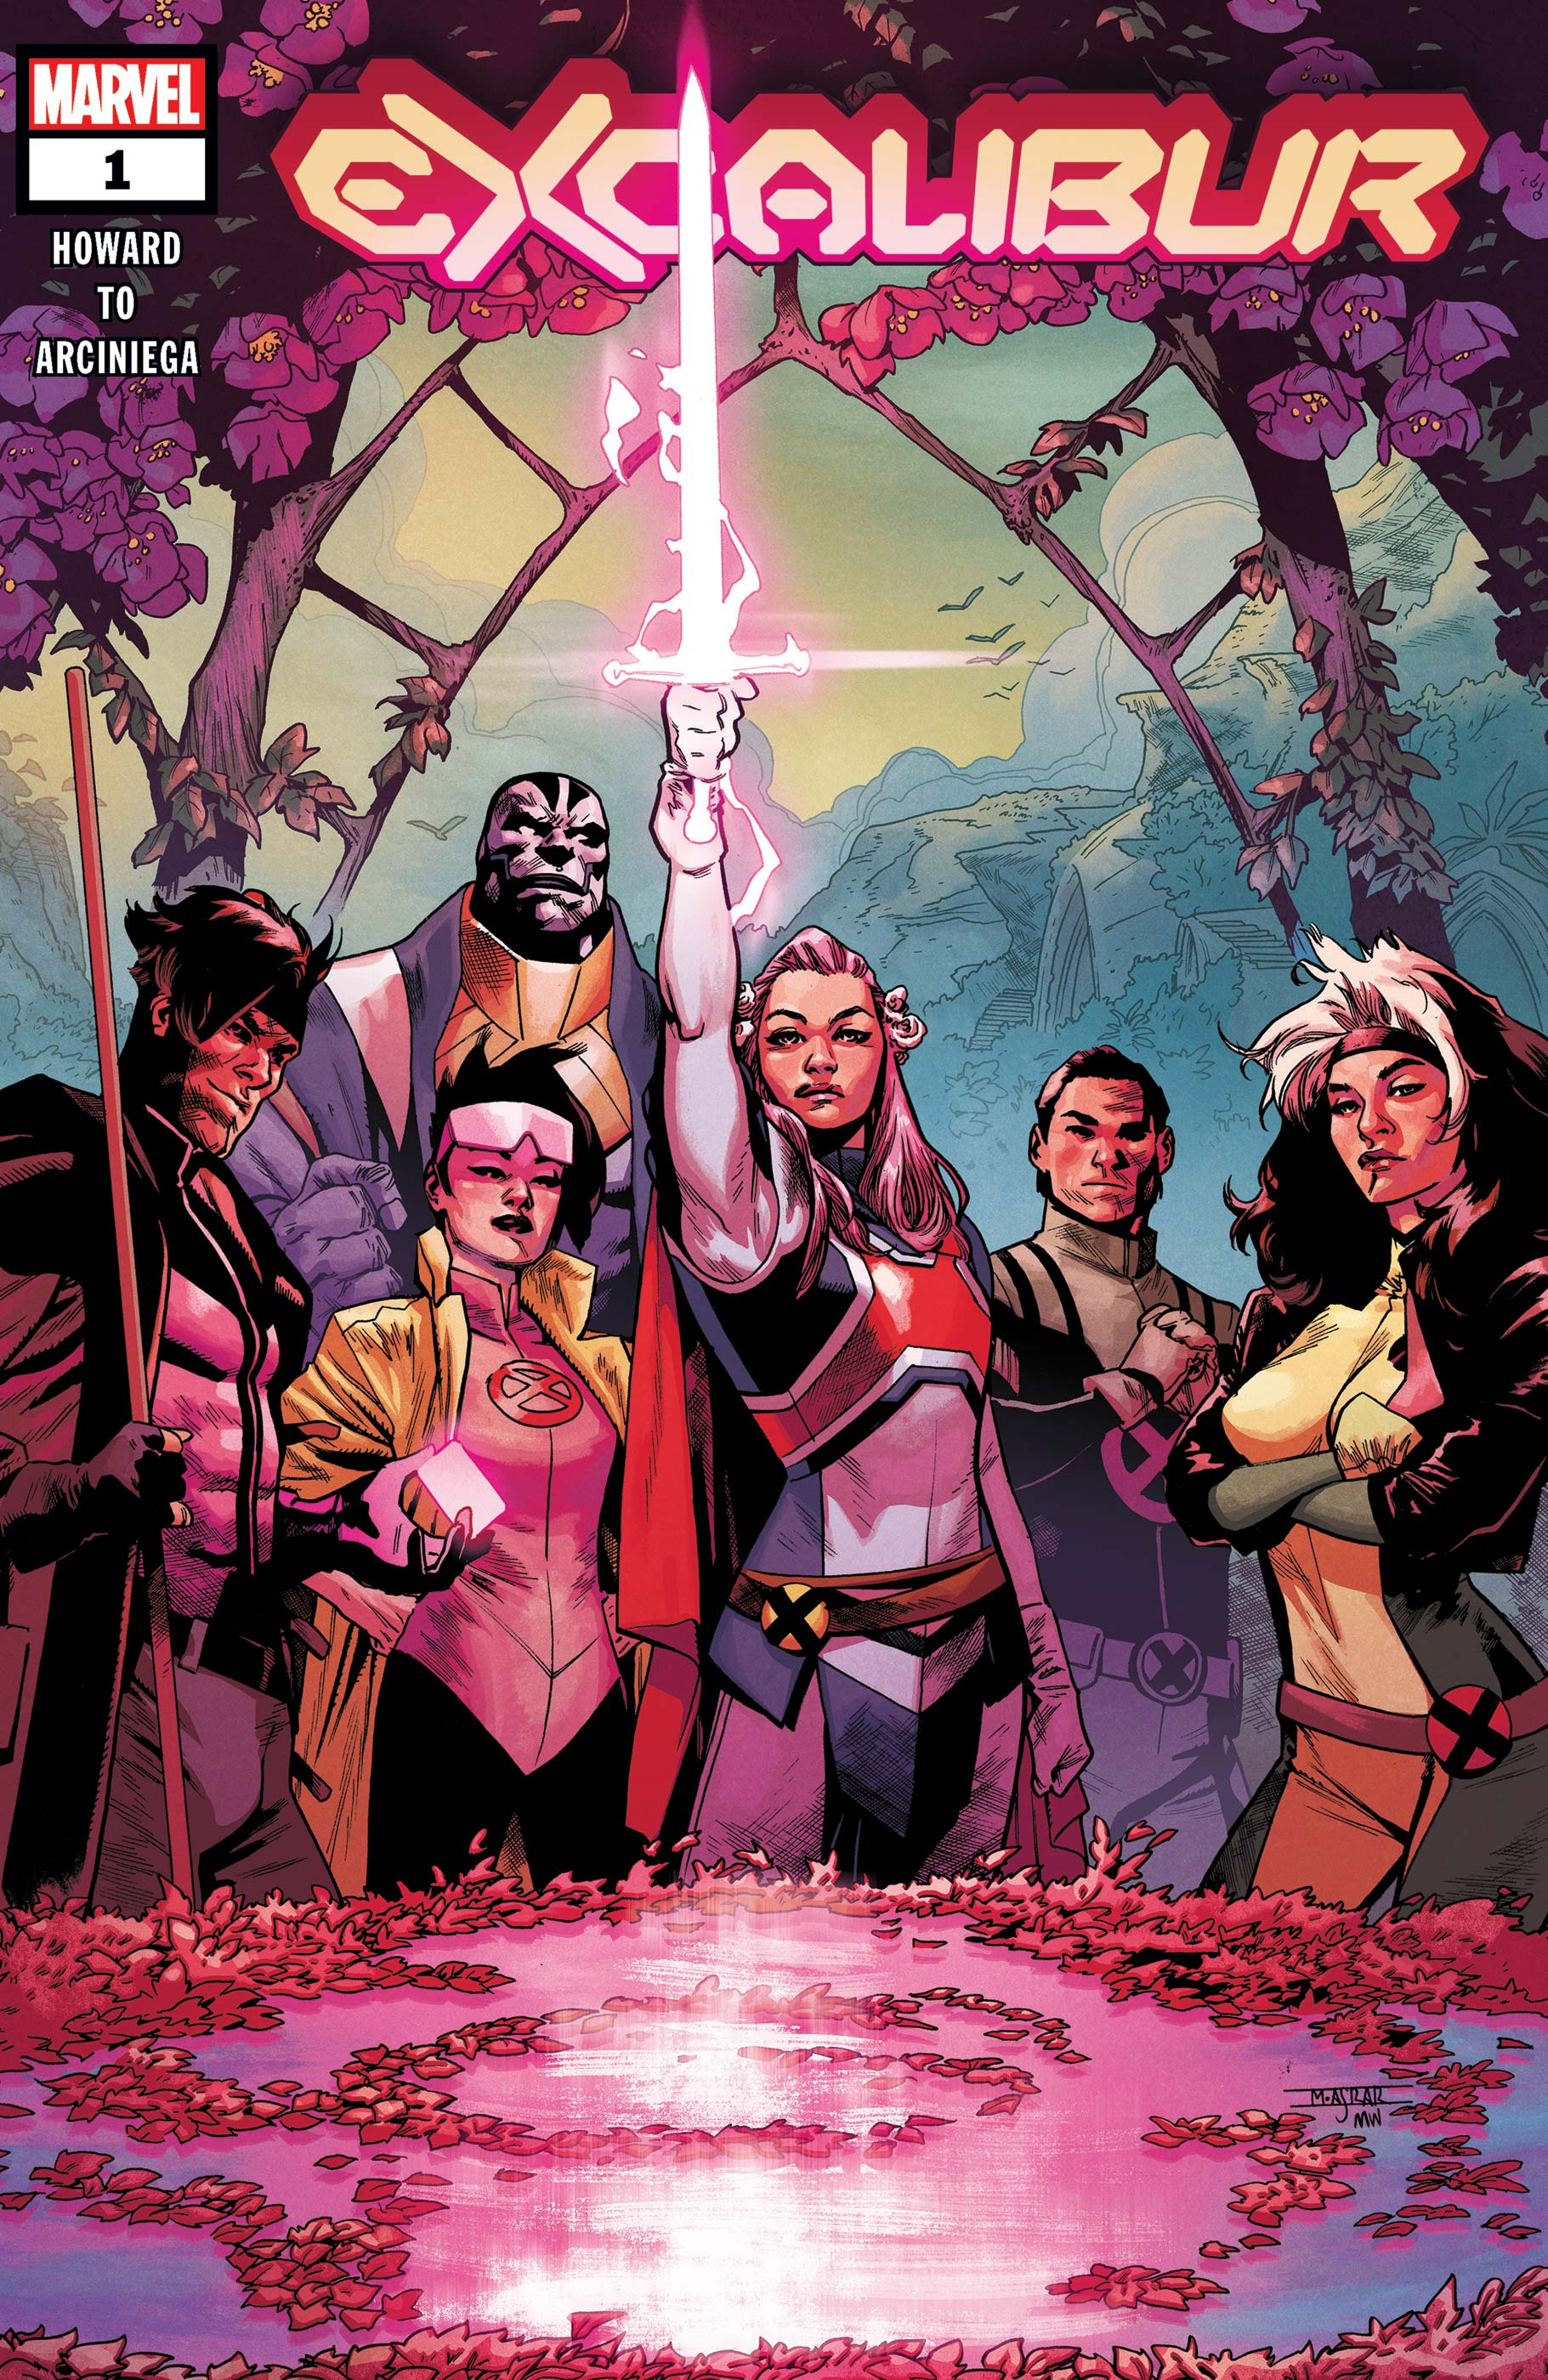 Excalibur #1-Marvel Comics(2019)